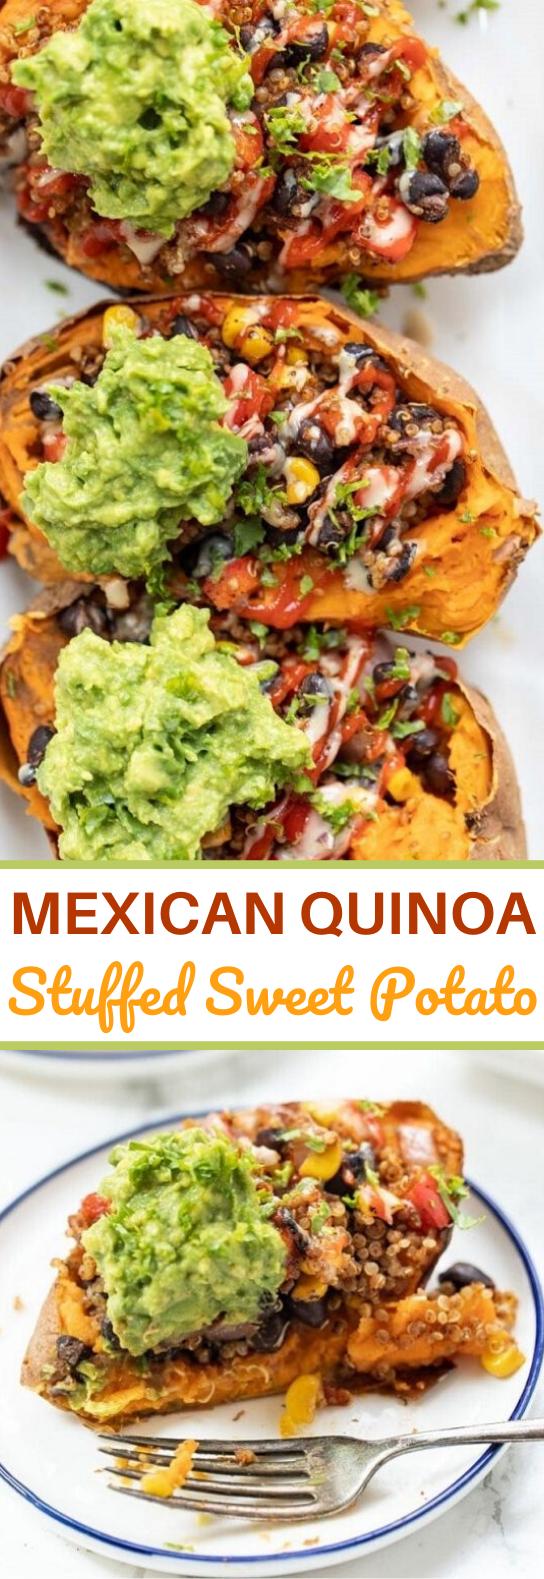 Mexican Quinoa Stuffed Sweet Potatoes #vegetarian #plantbased #dinner #sweetpotato #vegan